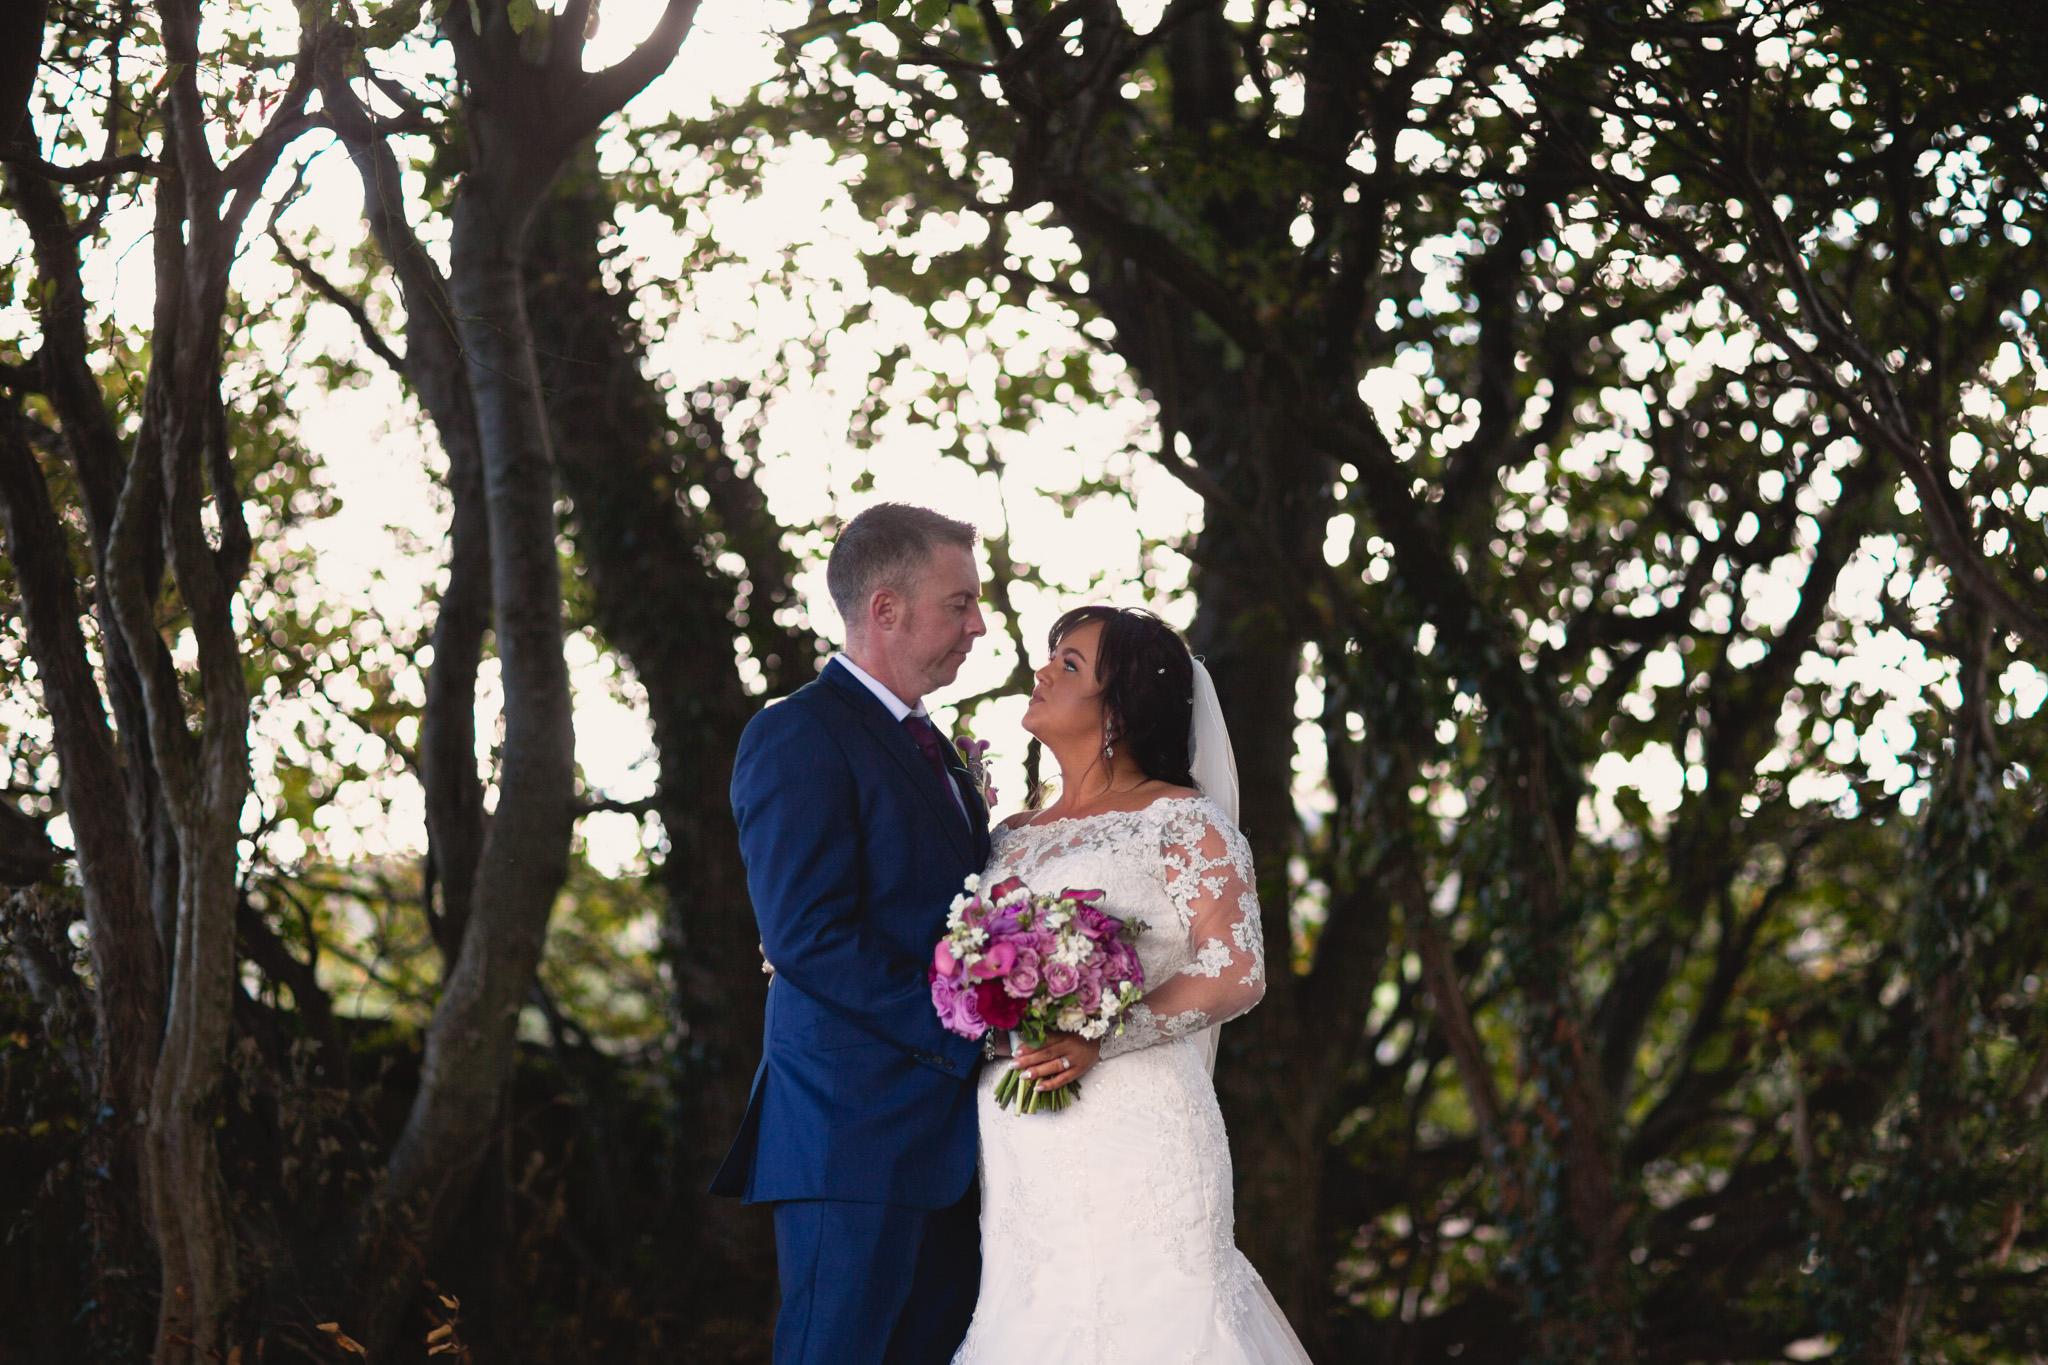 Mark_Barnes_Northern_Ireland_Wedding_Photography_Marine_hotel_ballycastle_Wedding_Photography_Janet&Darren-17.jpg